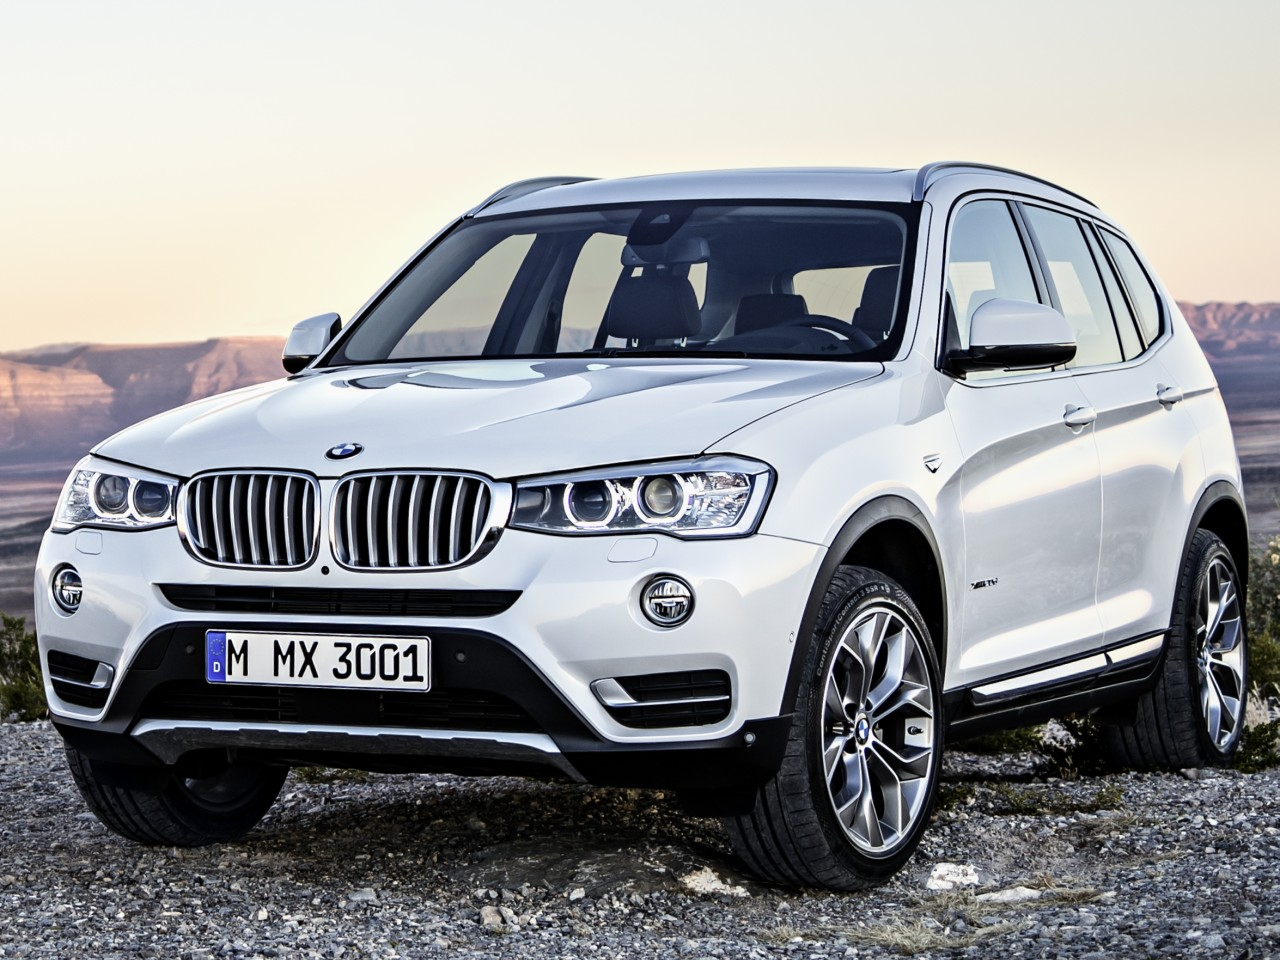 BMW X3 2011年モデル 新車画像